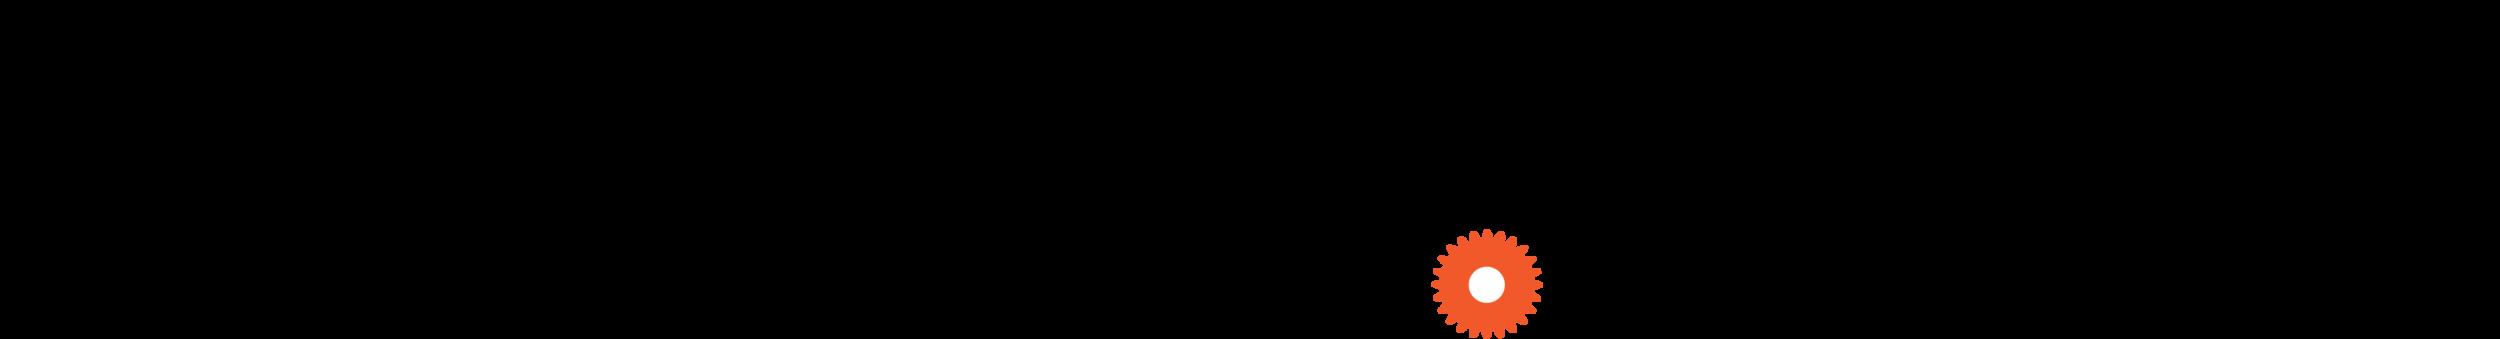 Industry Athletics logo.png